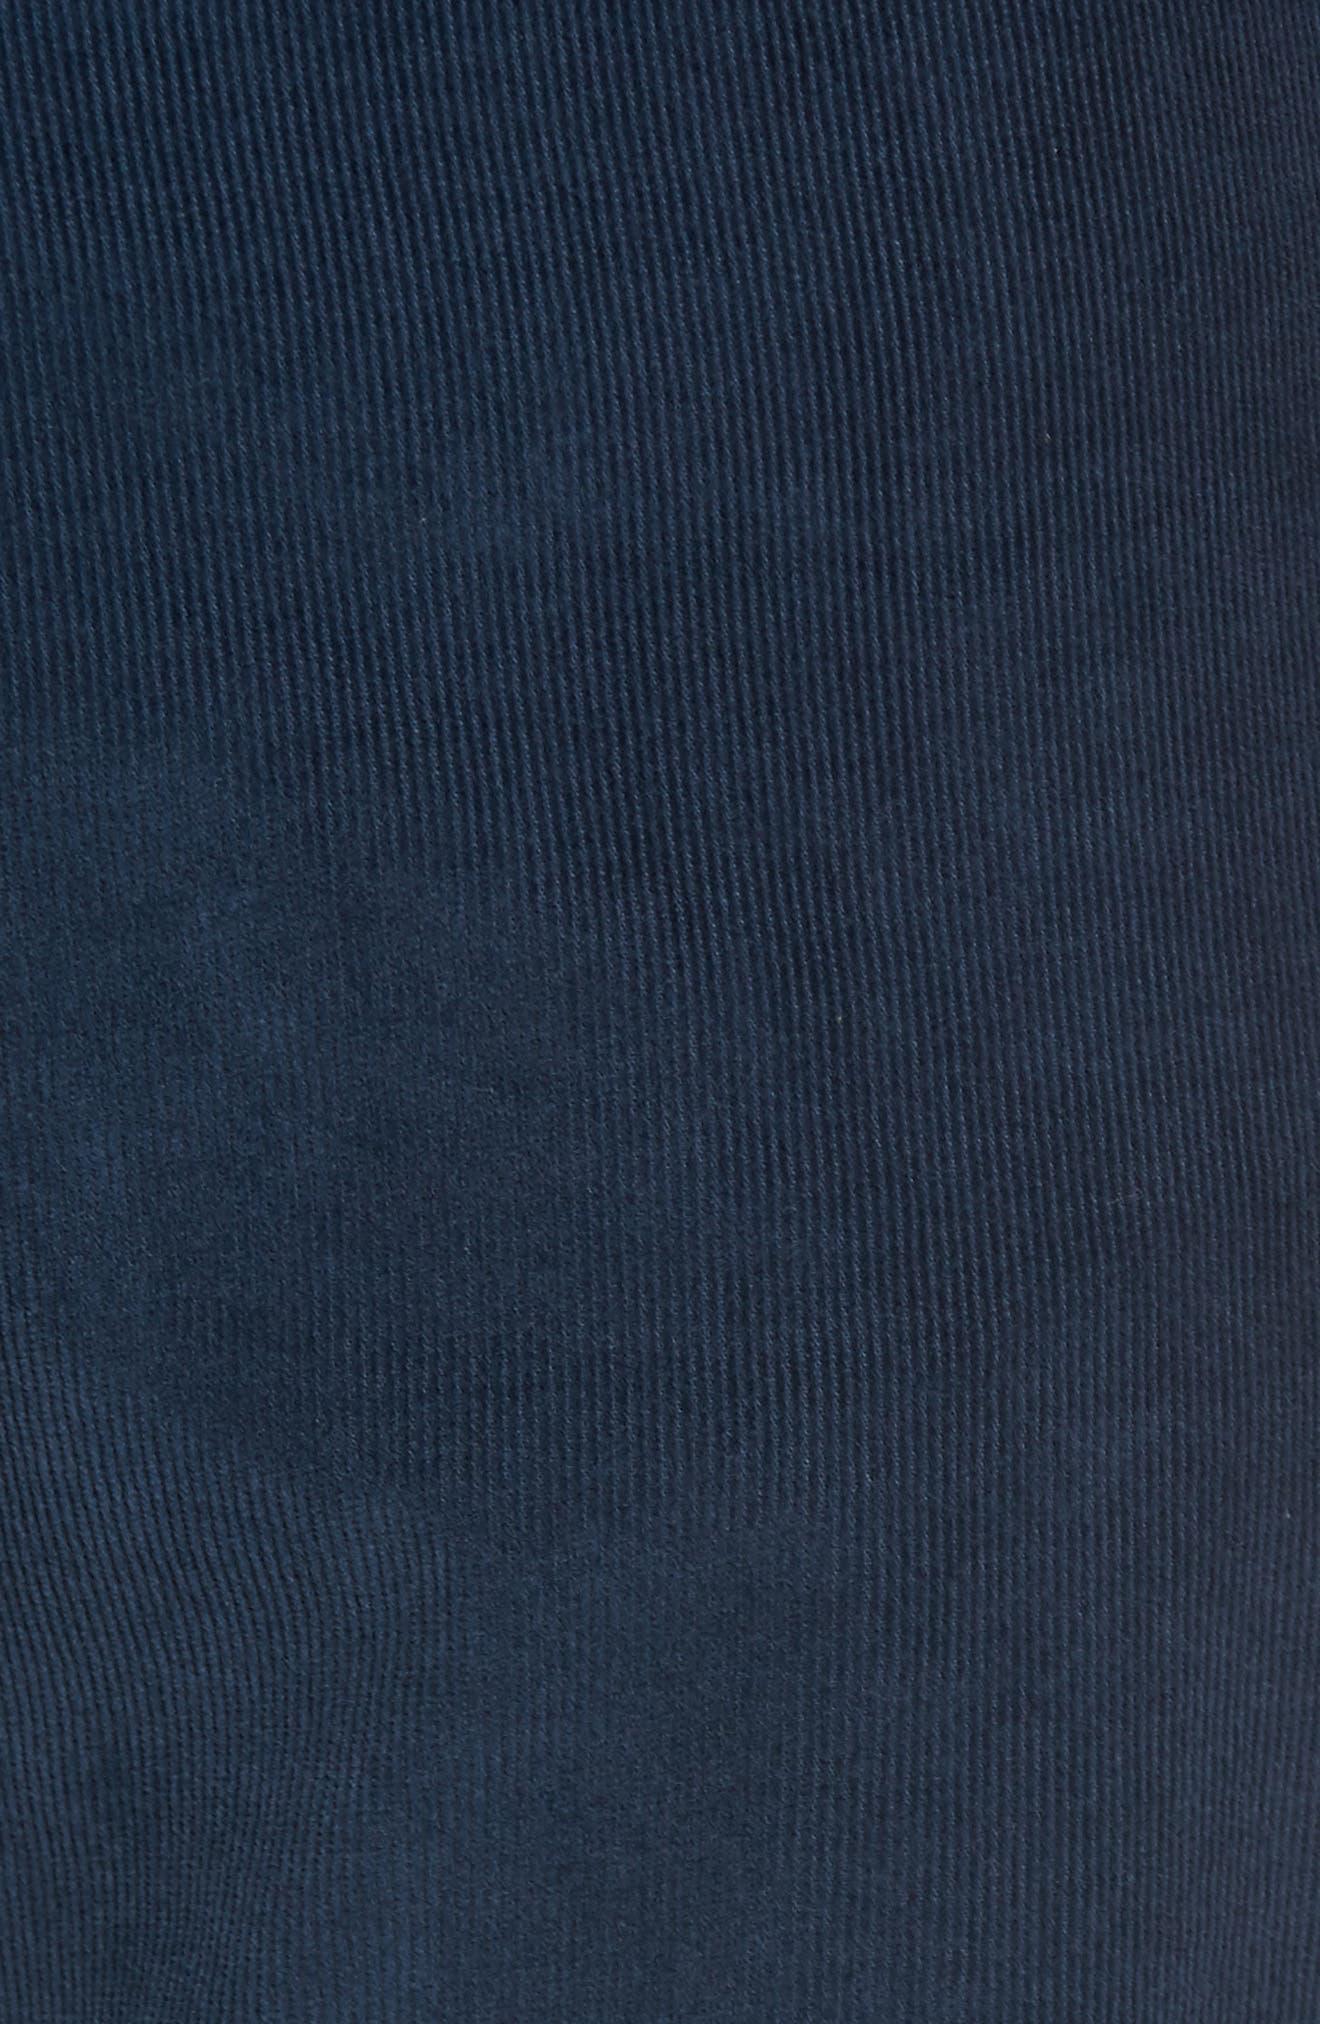 Redonda Stretch Corduroy Trousers,                             Alternate thumbnail 5, color,                             Midnight